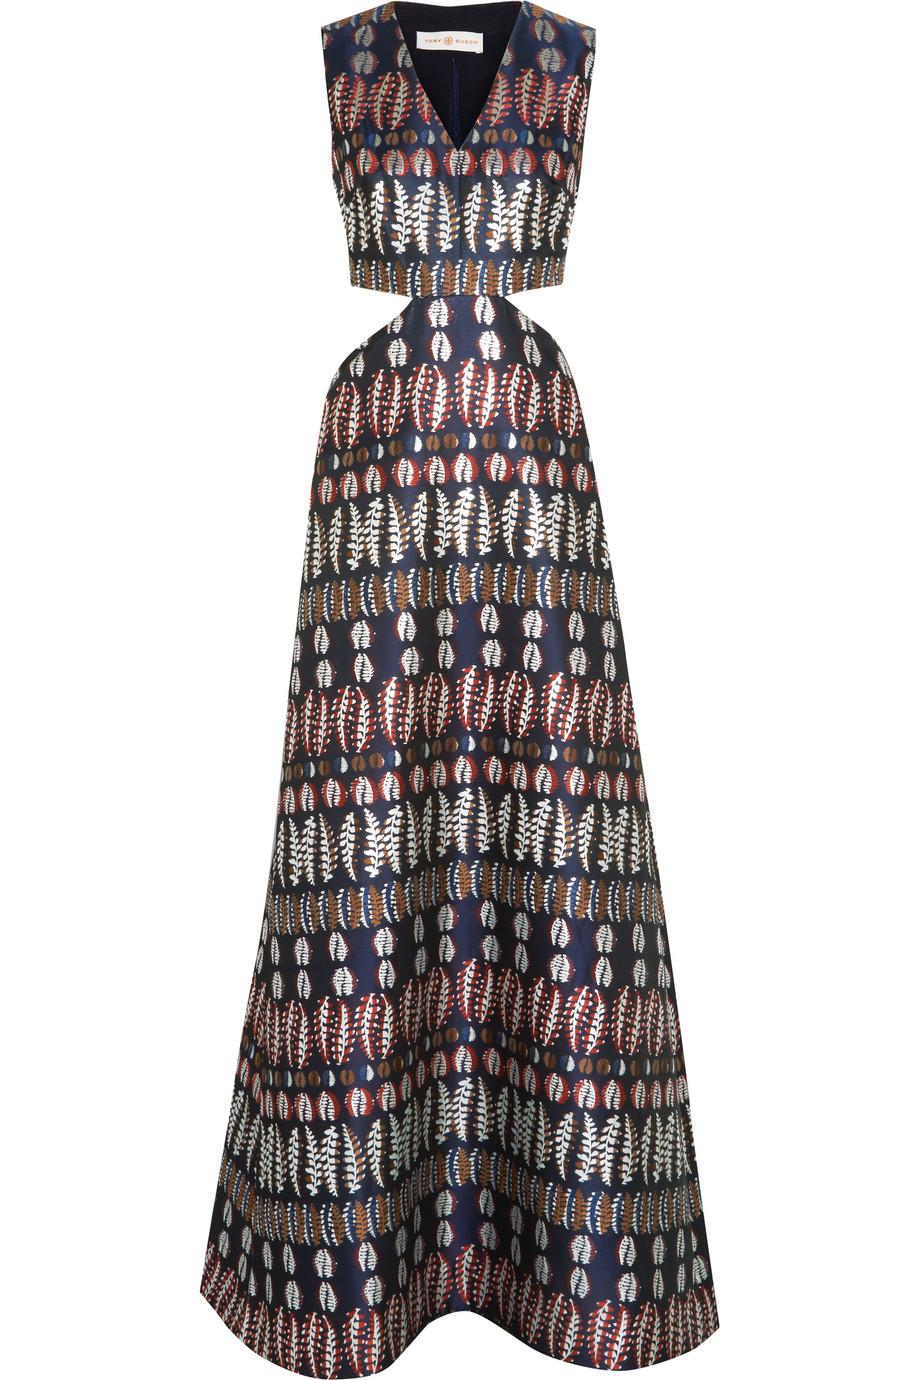 Tory Burch Cutout Jacquard Gown, Storm Blue, Women's - Jacquard, Size: 12